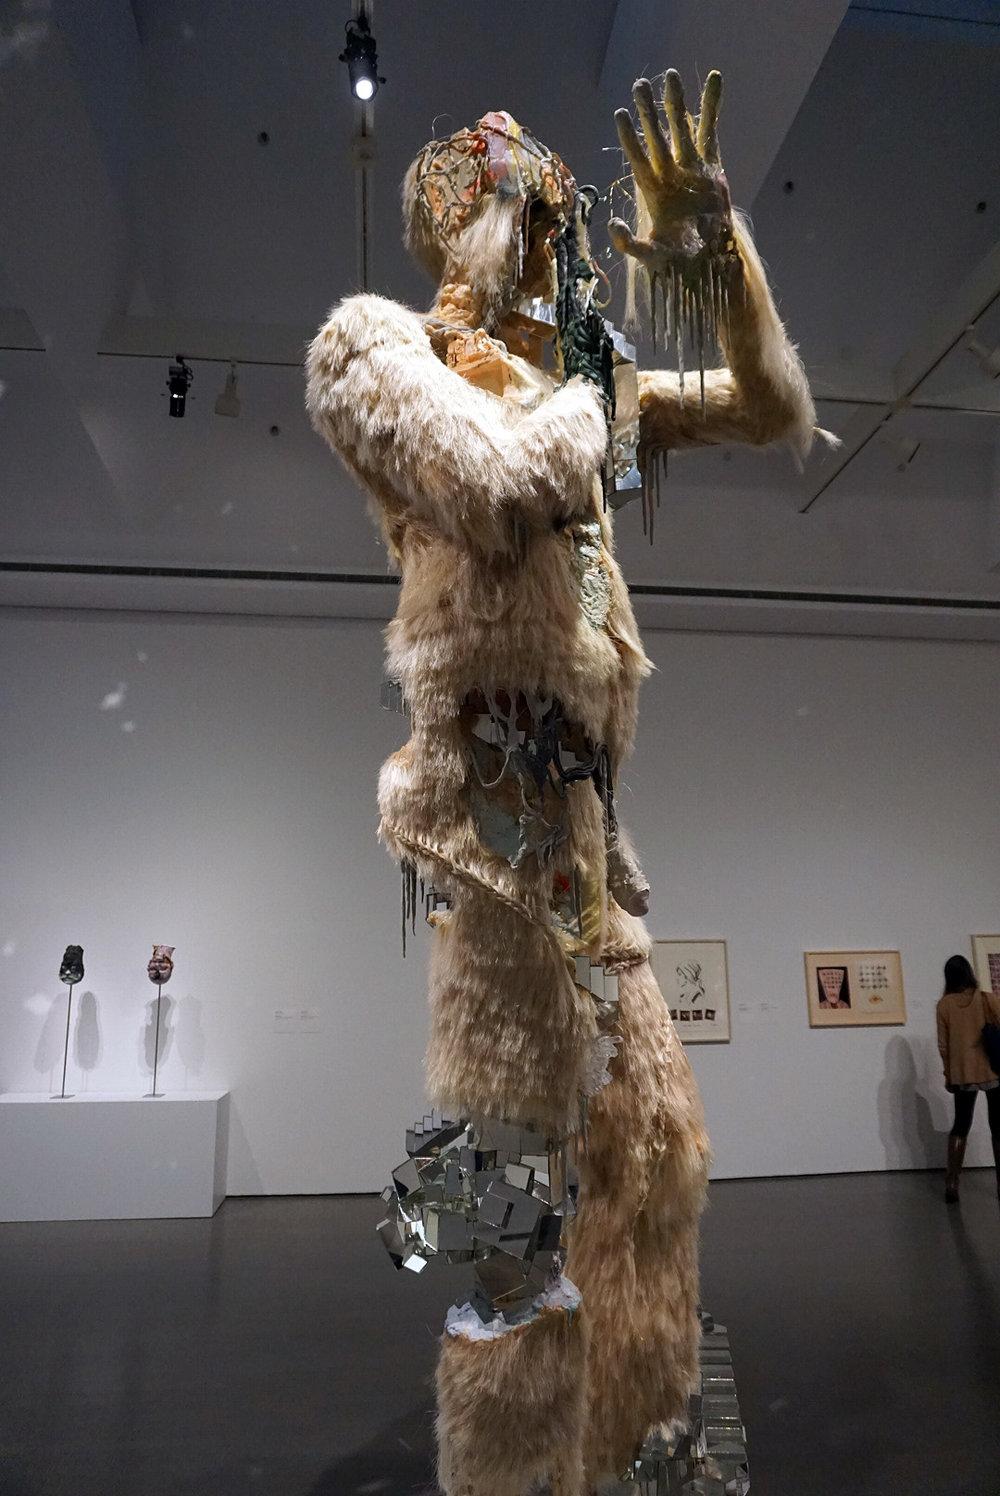 Musée-d'art-contemporain-de-Montréal-Canada-Traveller-Travel-Blogger-LINDATENCHITRAN-7-1616x1080.jpg